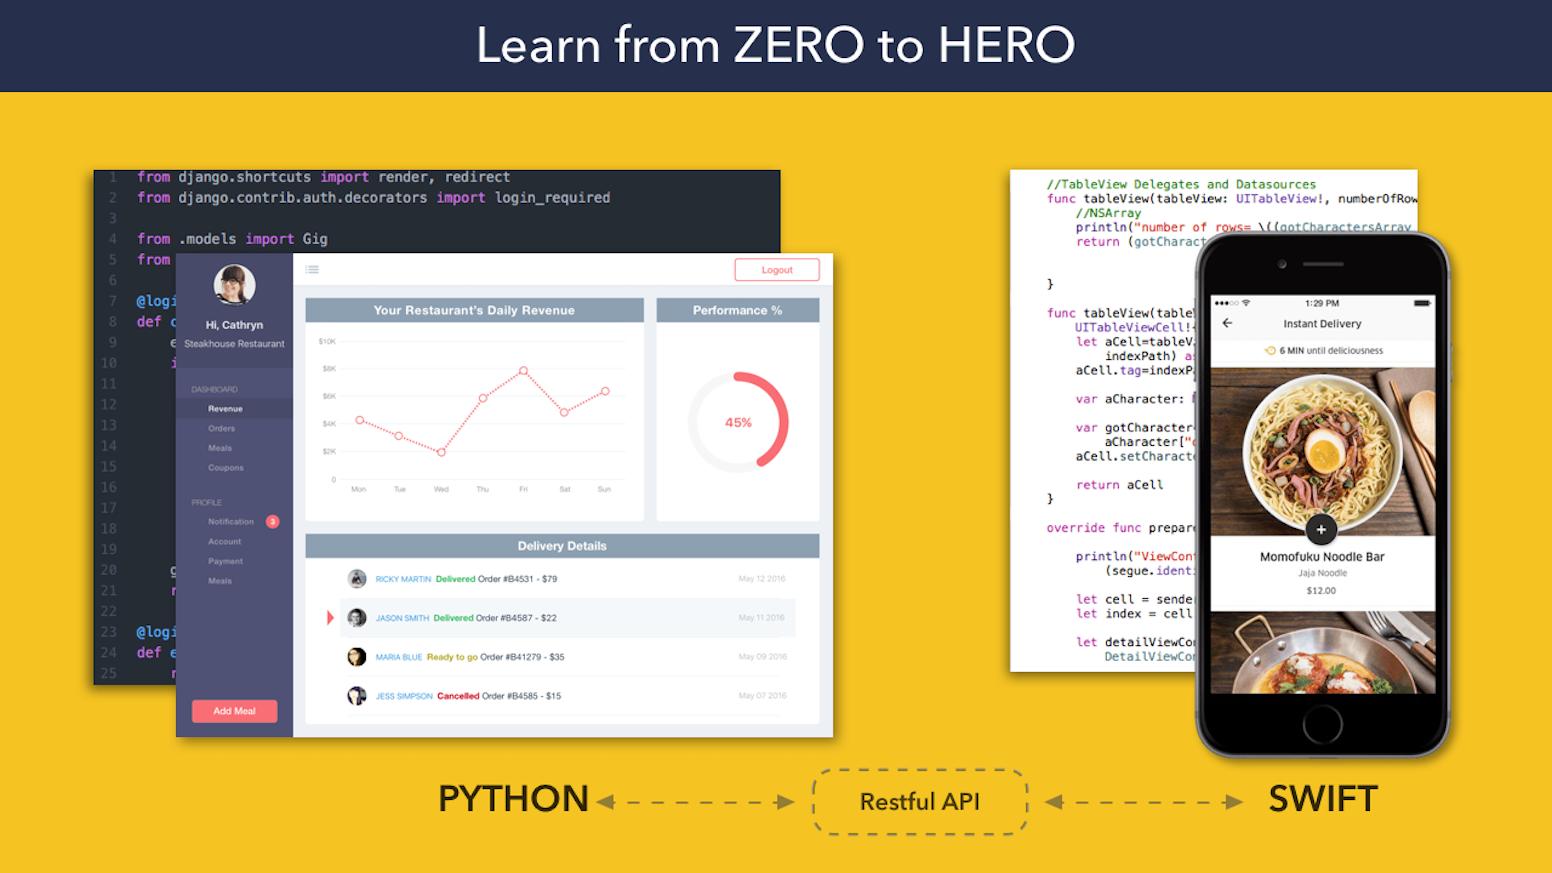 Learn Python & Swift 20 from ZERO to HERO by Leo Trieu — Kickstarter